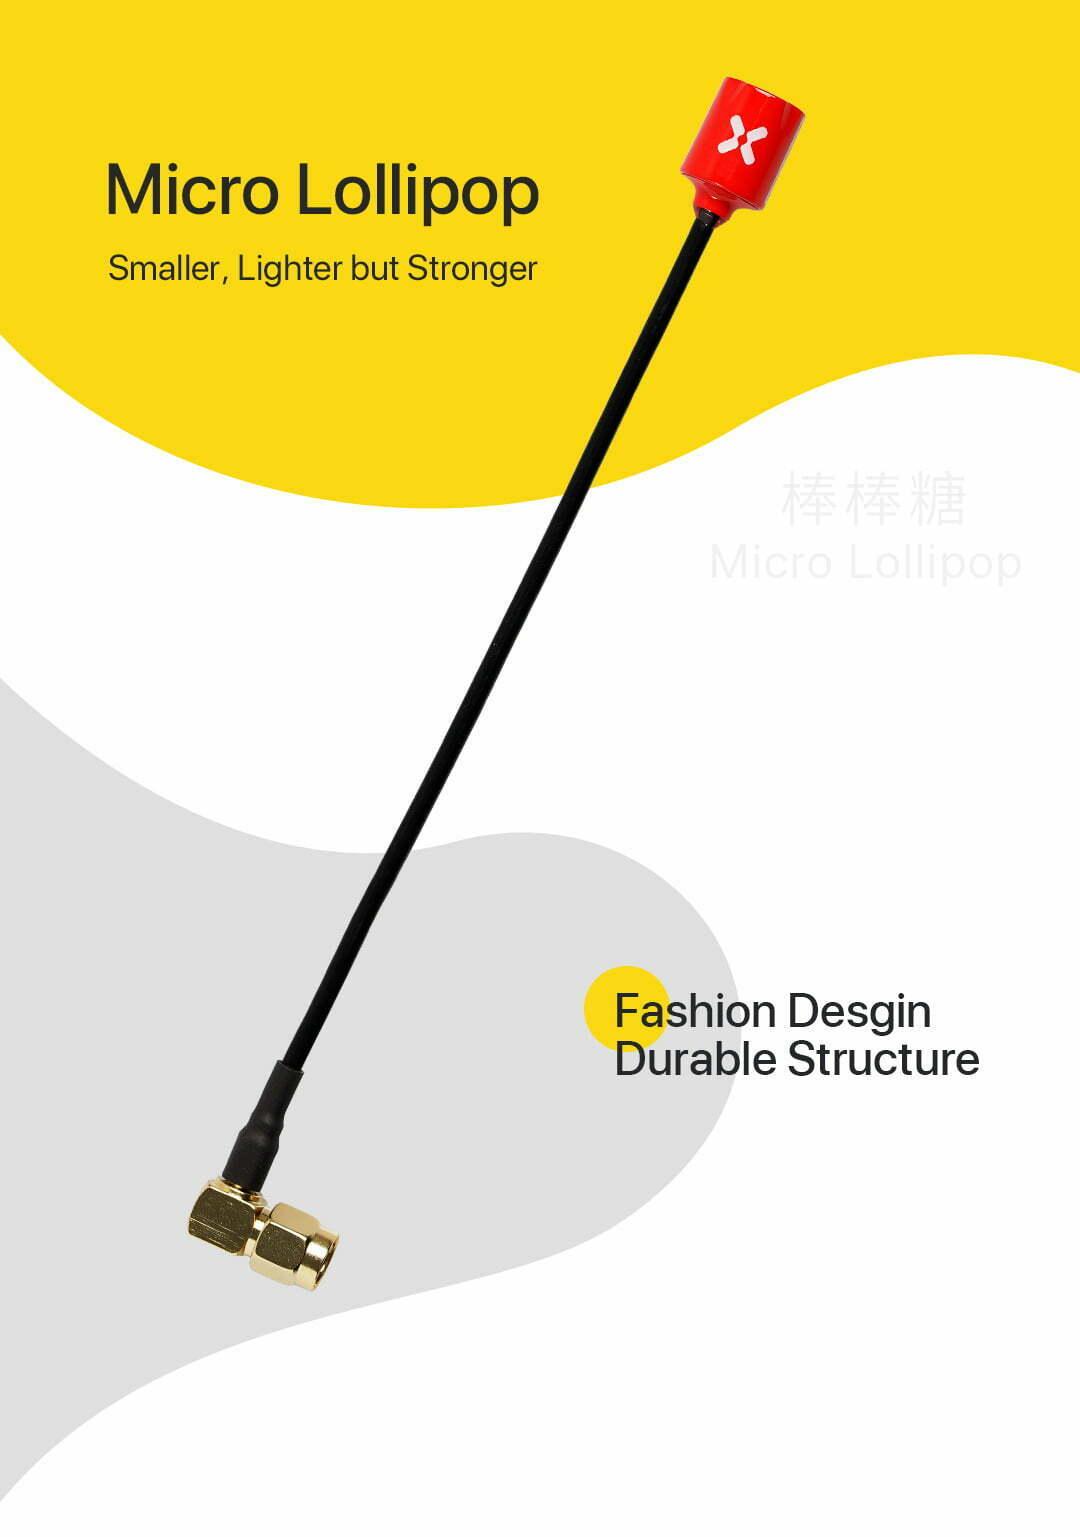 foxeer micro lollipop 15cm 5 8g omni angle sma rhcp antenna for goggles australia mantisfpv